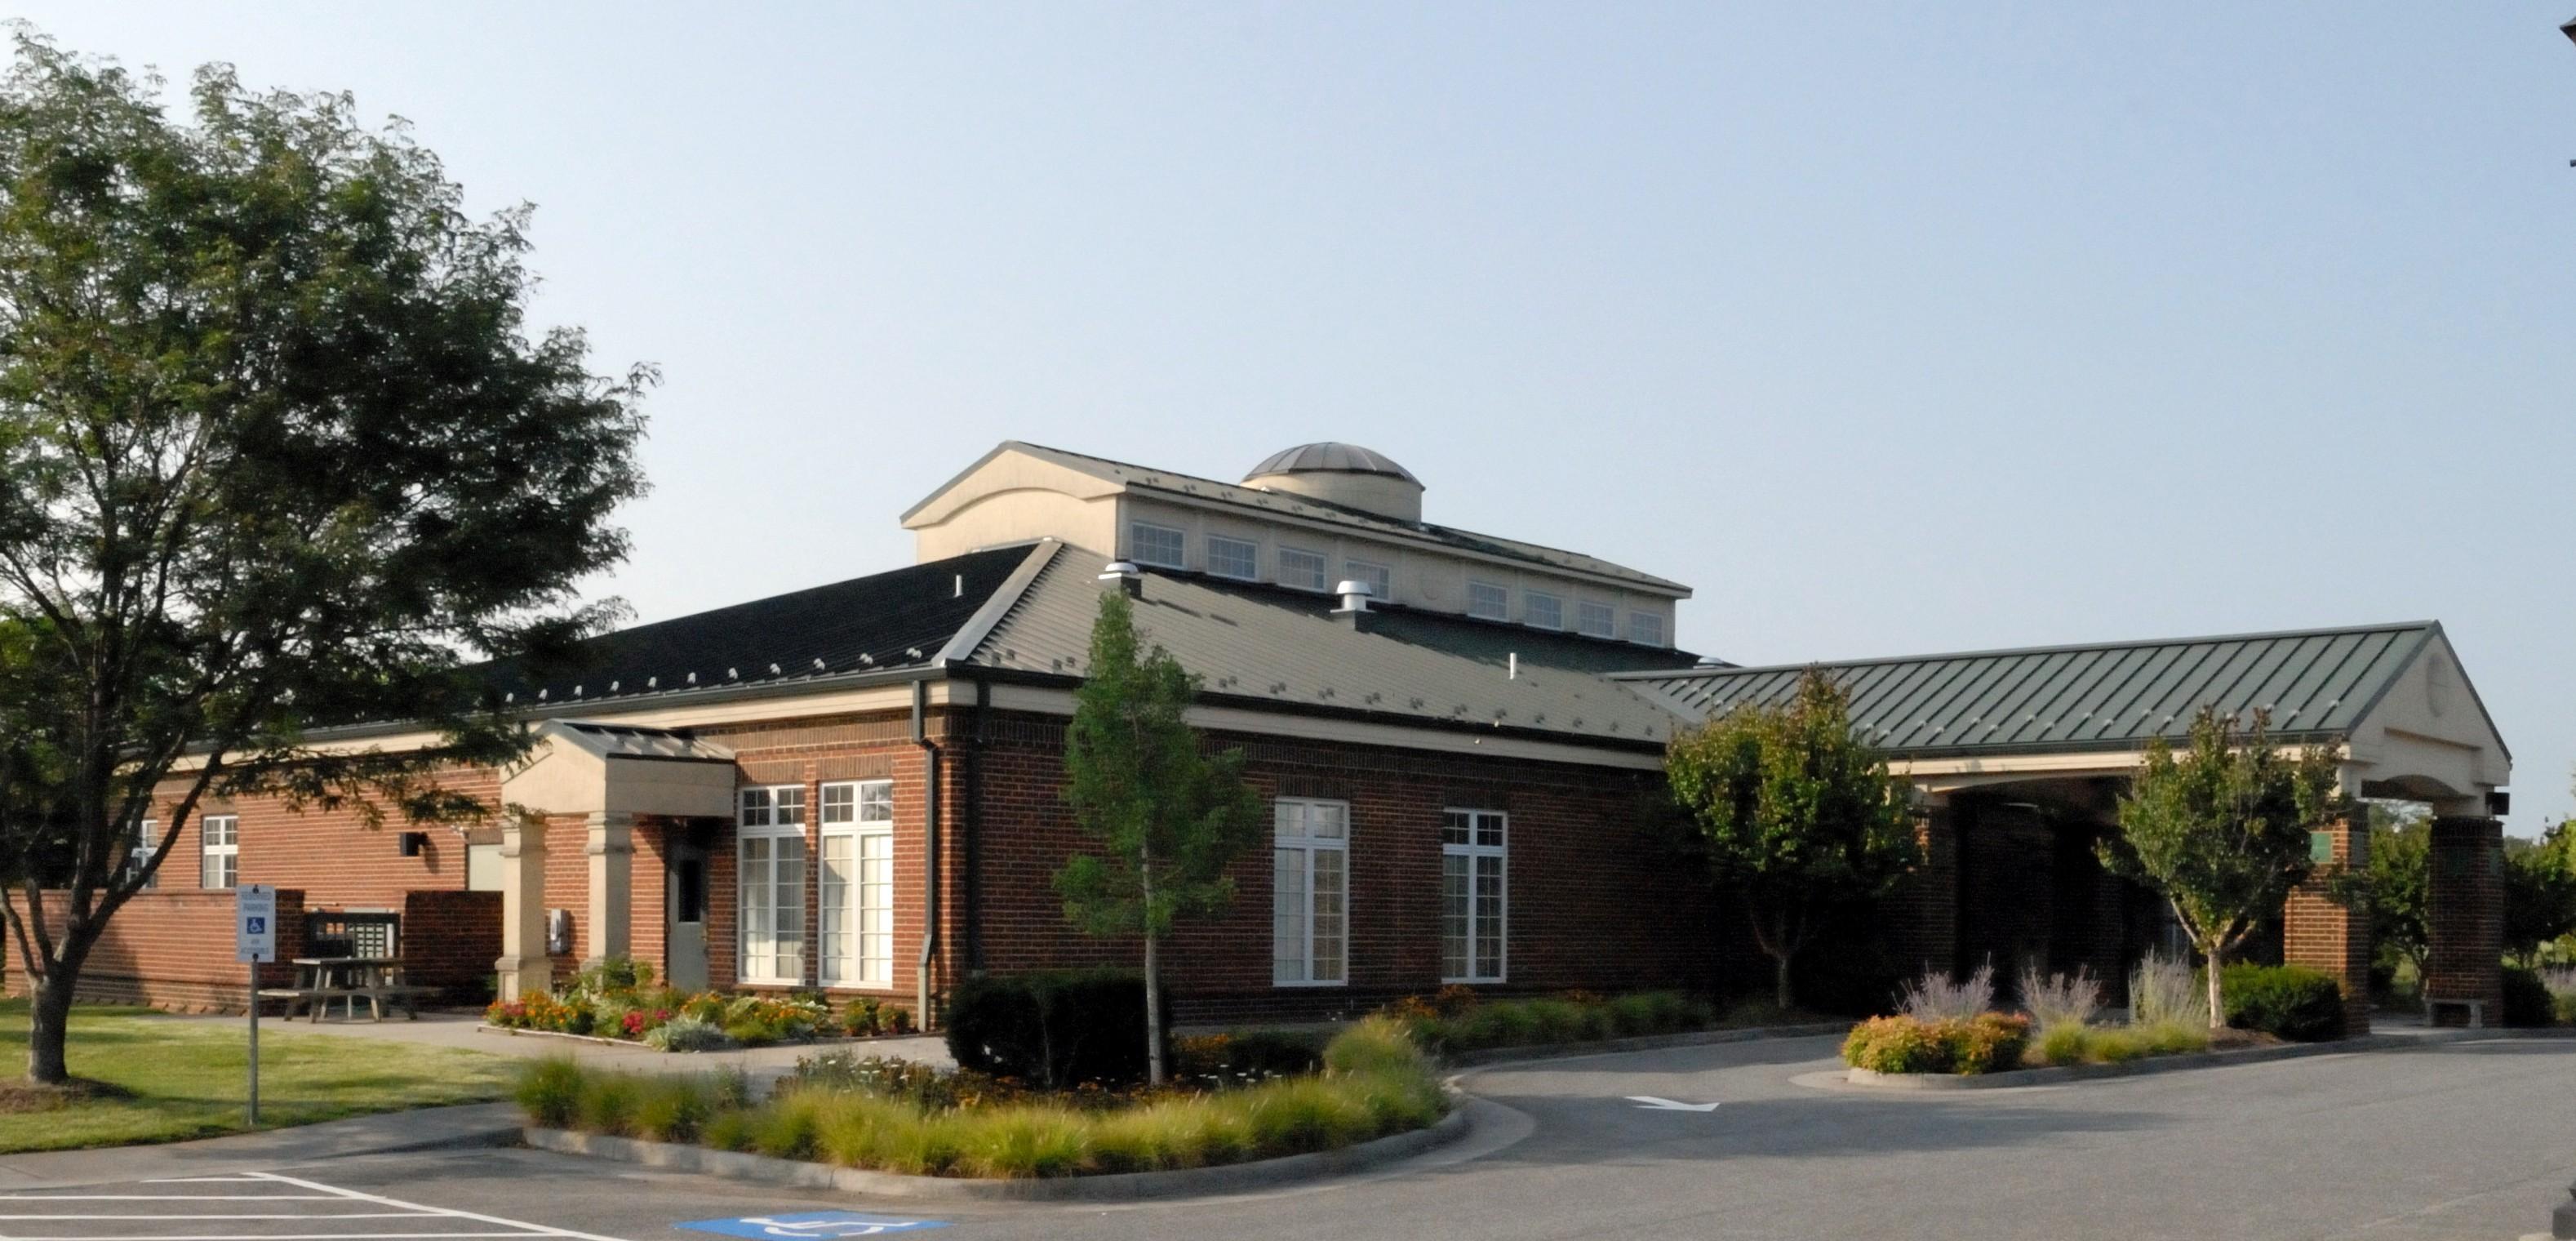 Image of Moneta Library